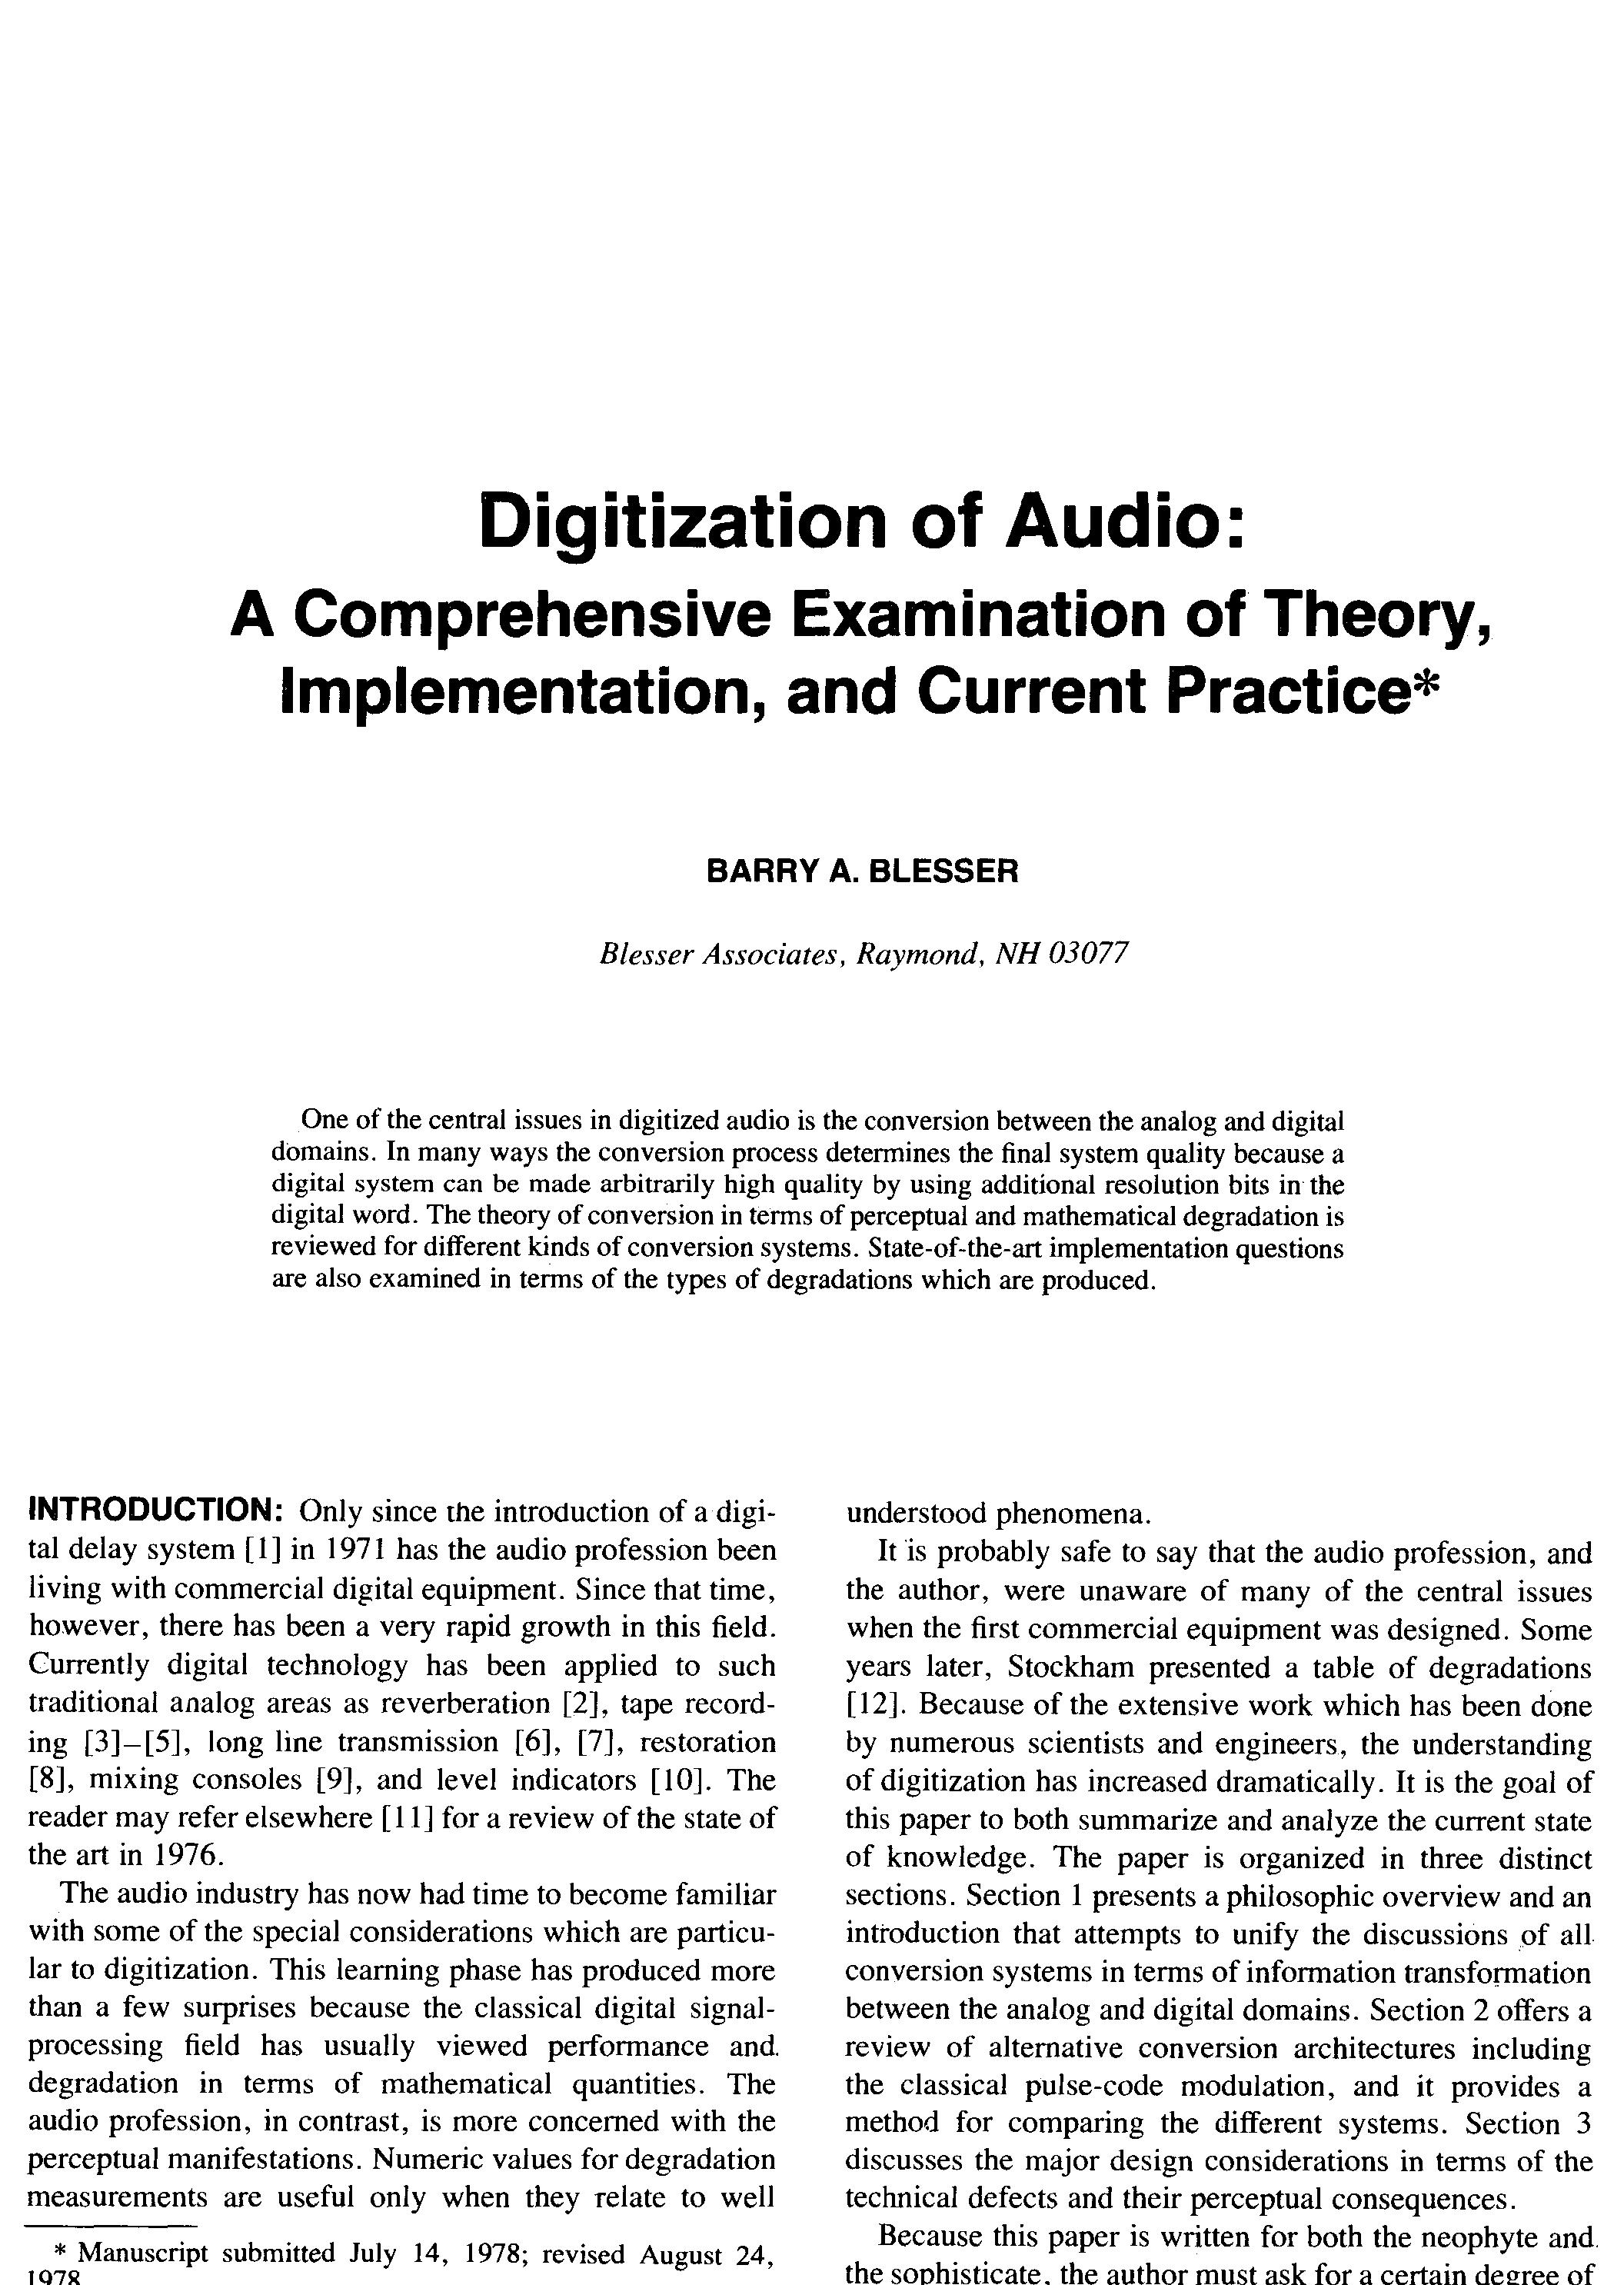 aes e library digitization of audio a comprehensive examination